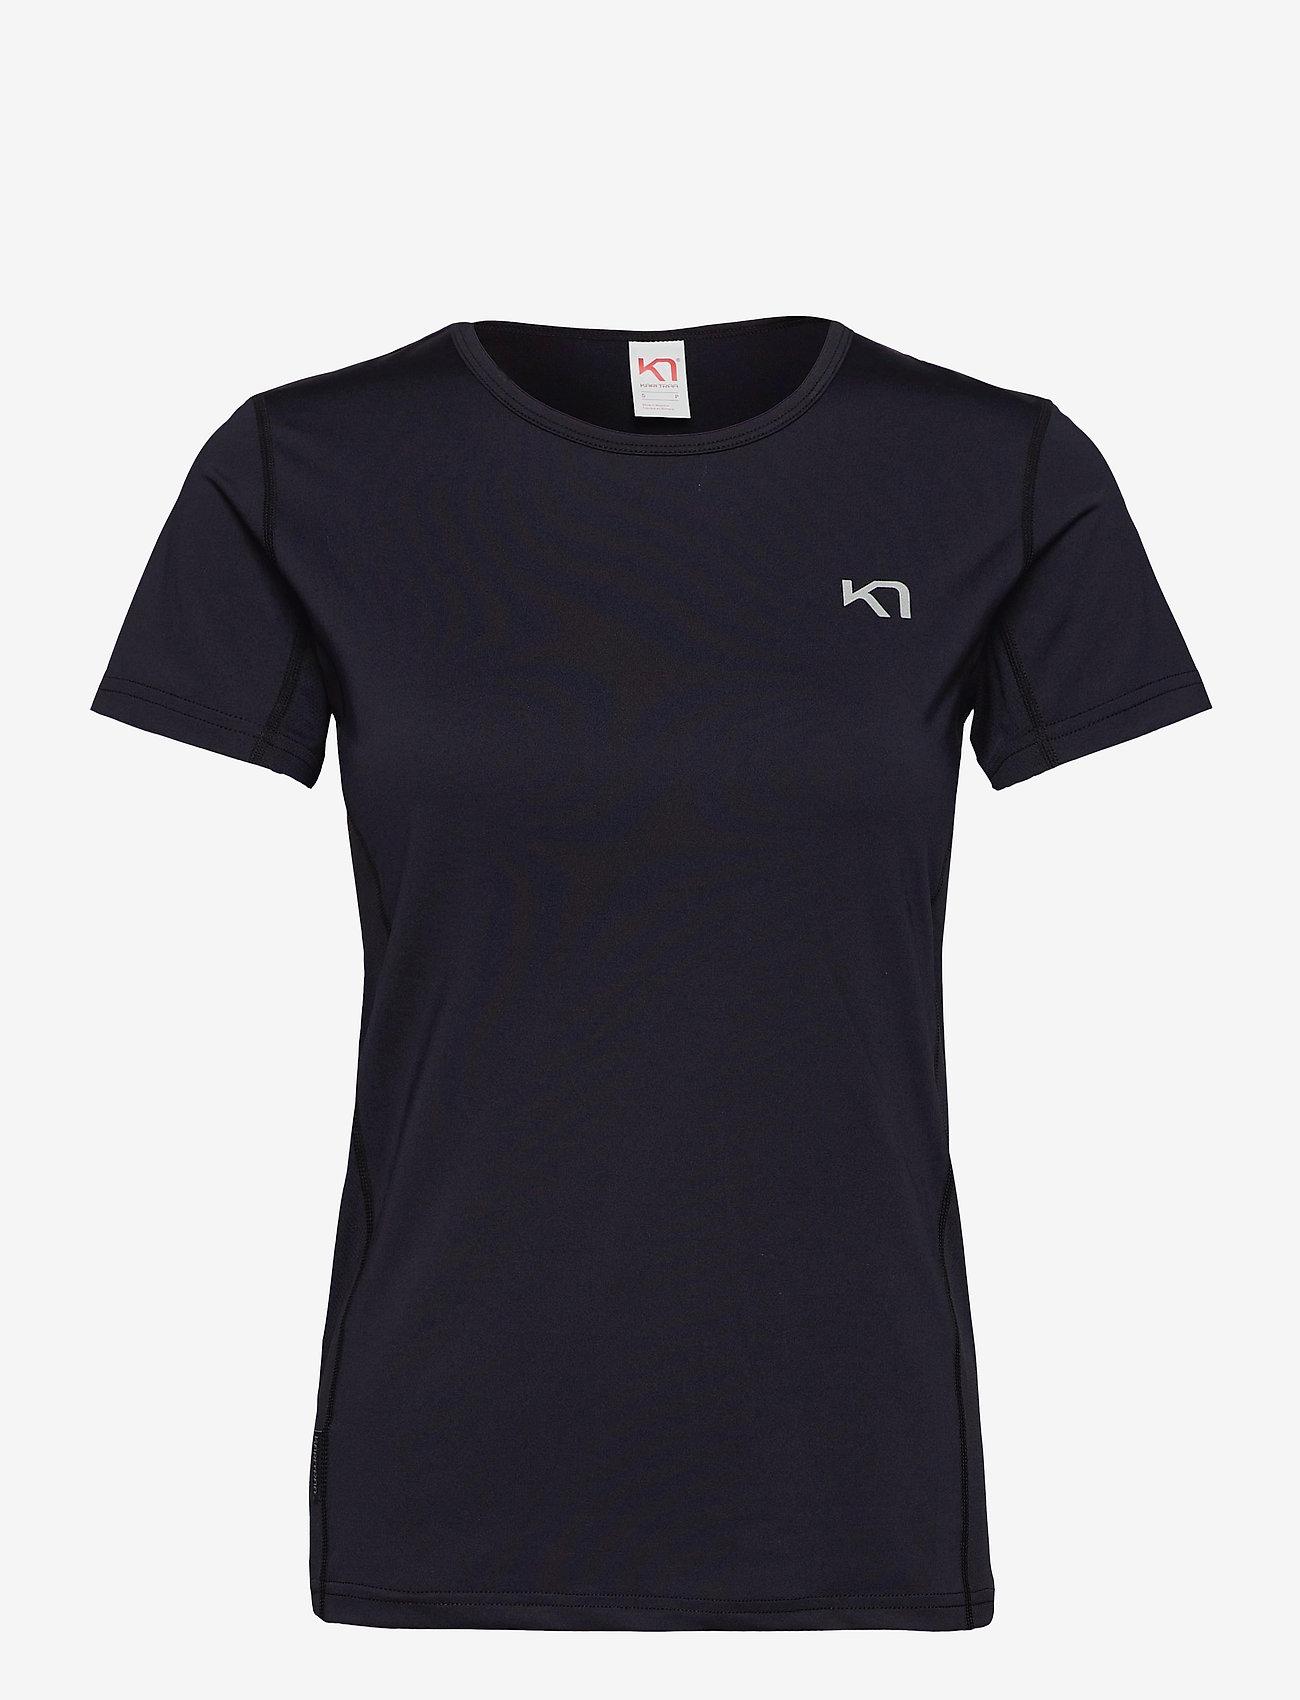 Kari Traa - NORA TEE - t-shirts - black - 0